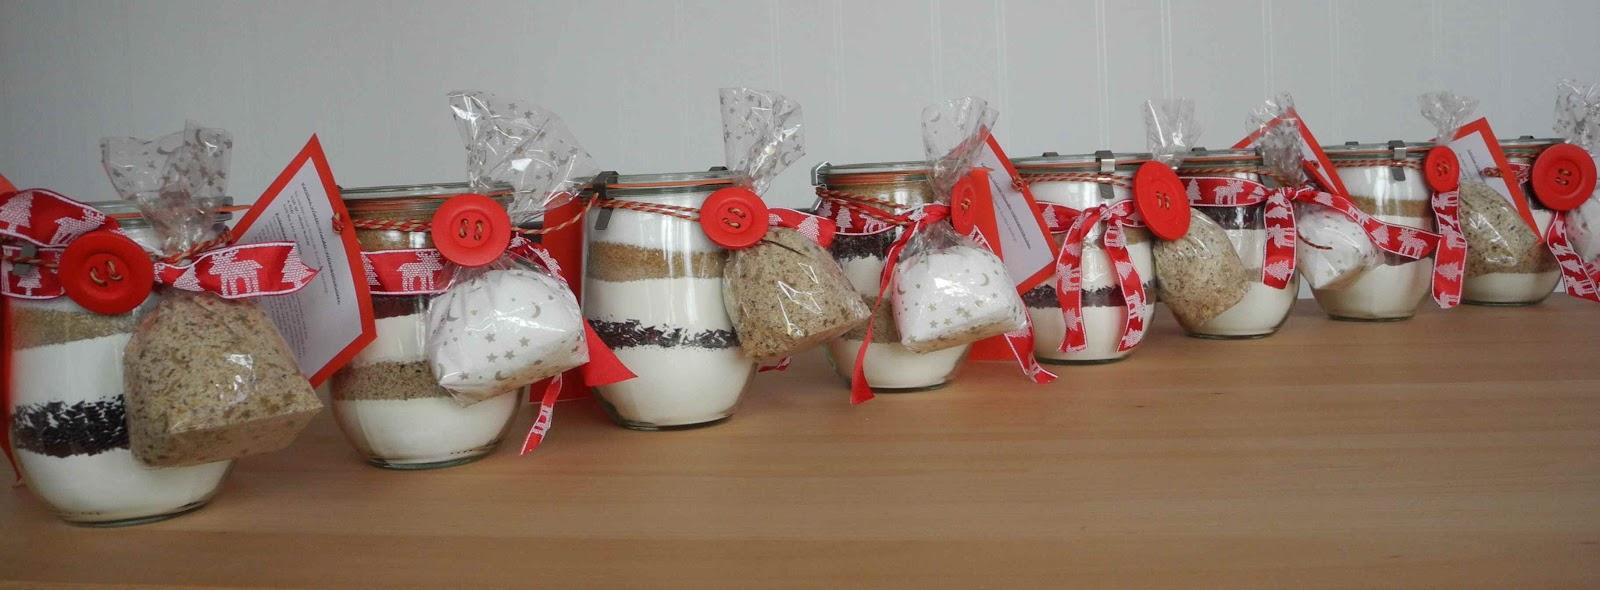 rezept backofen kuchen im glas weck